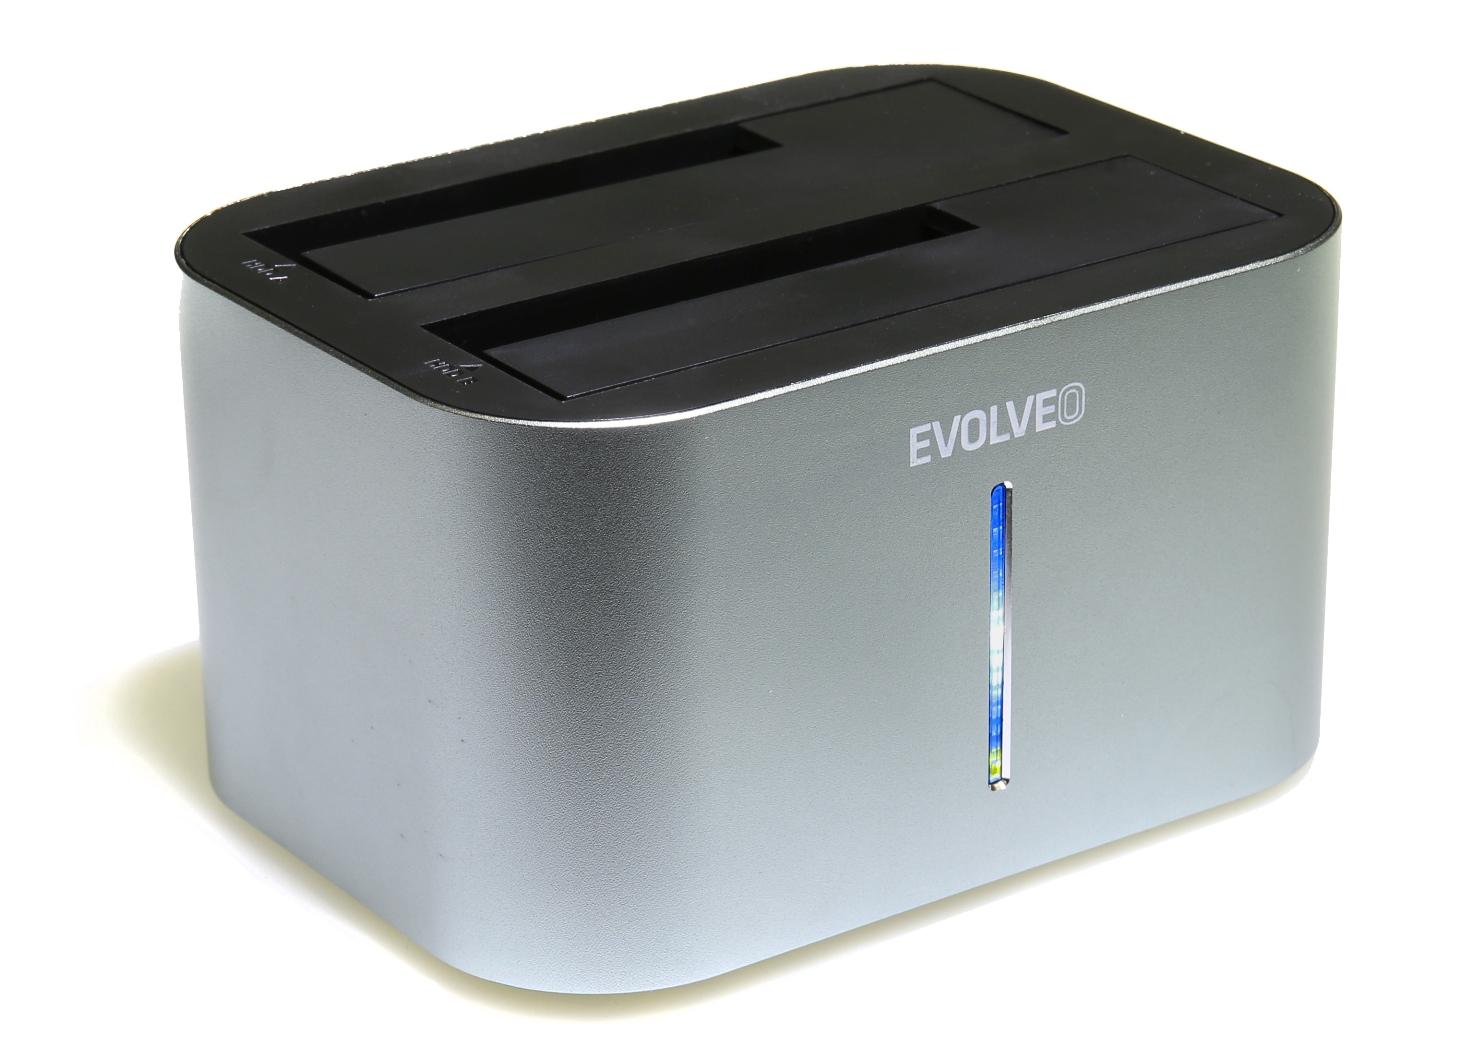 "EVOLVEO Dion 1 HDD dokovací stanice, USB 3.0, 2,5"" HDD, SDD a 3,5"" HDD"